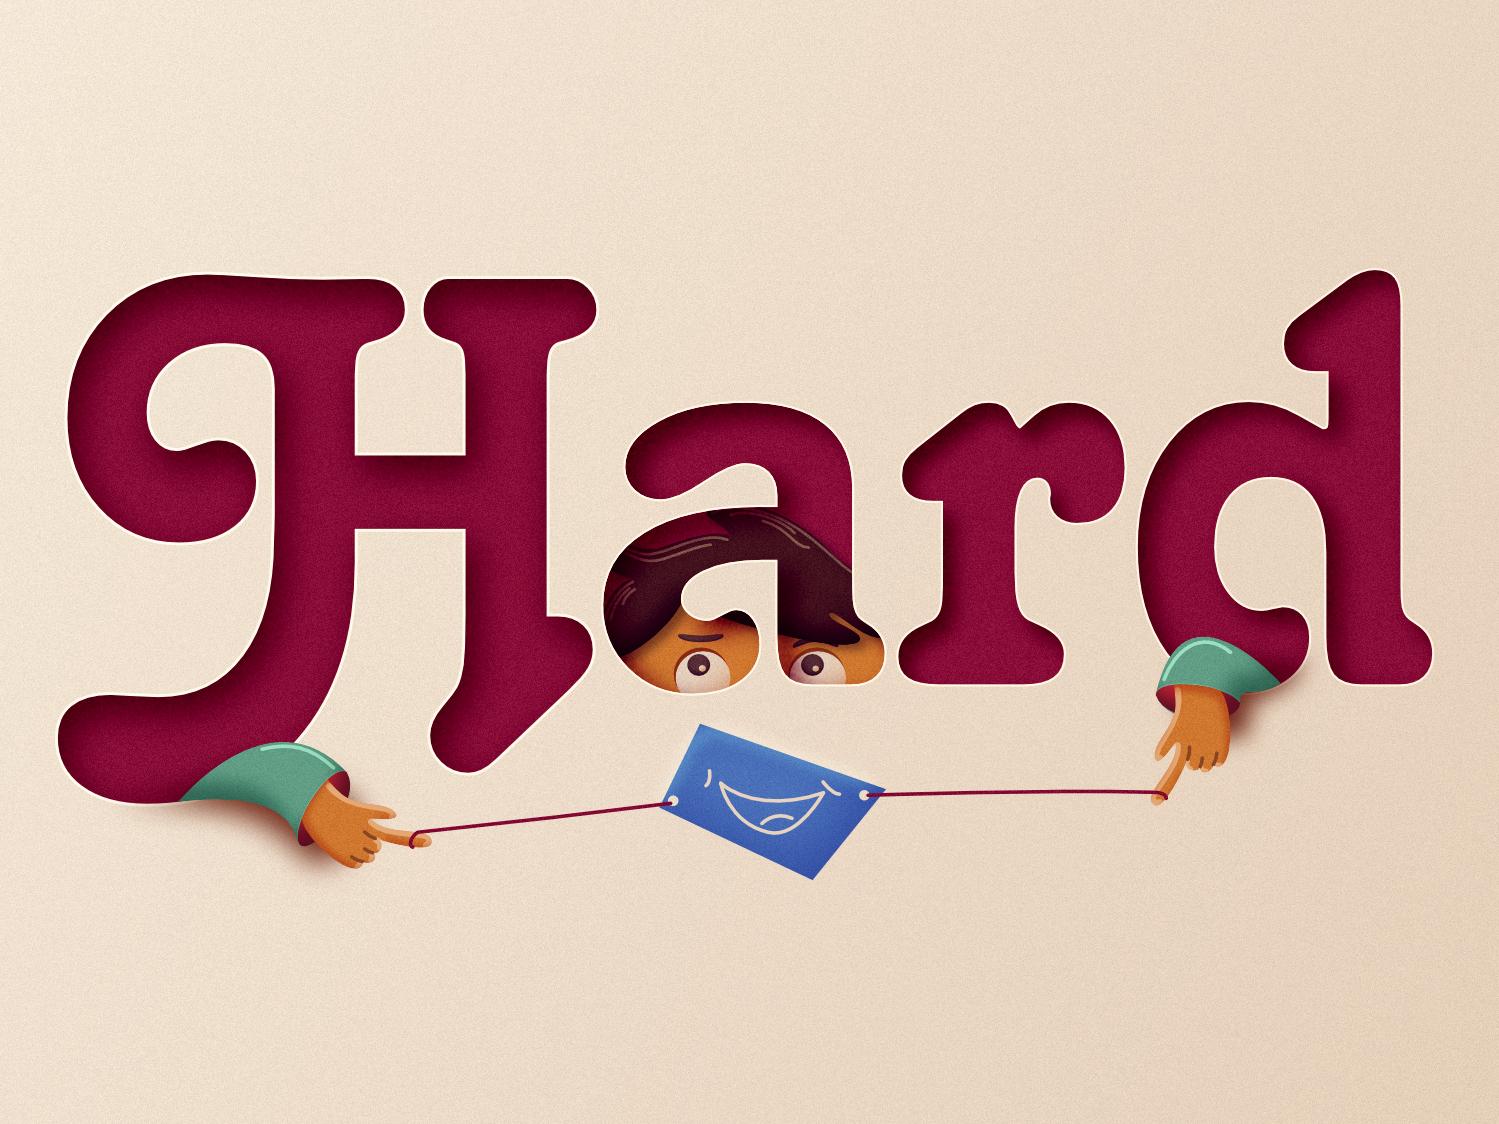 Hard hard vector typography character cartoon design illustration 2d